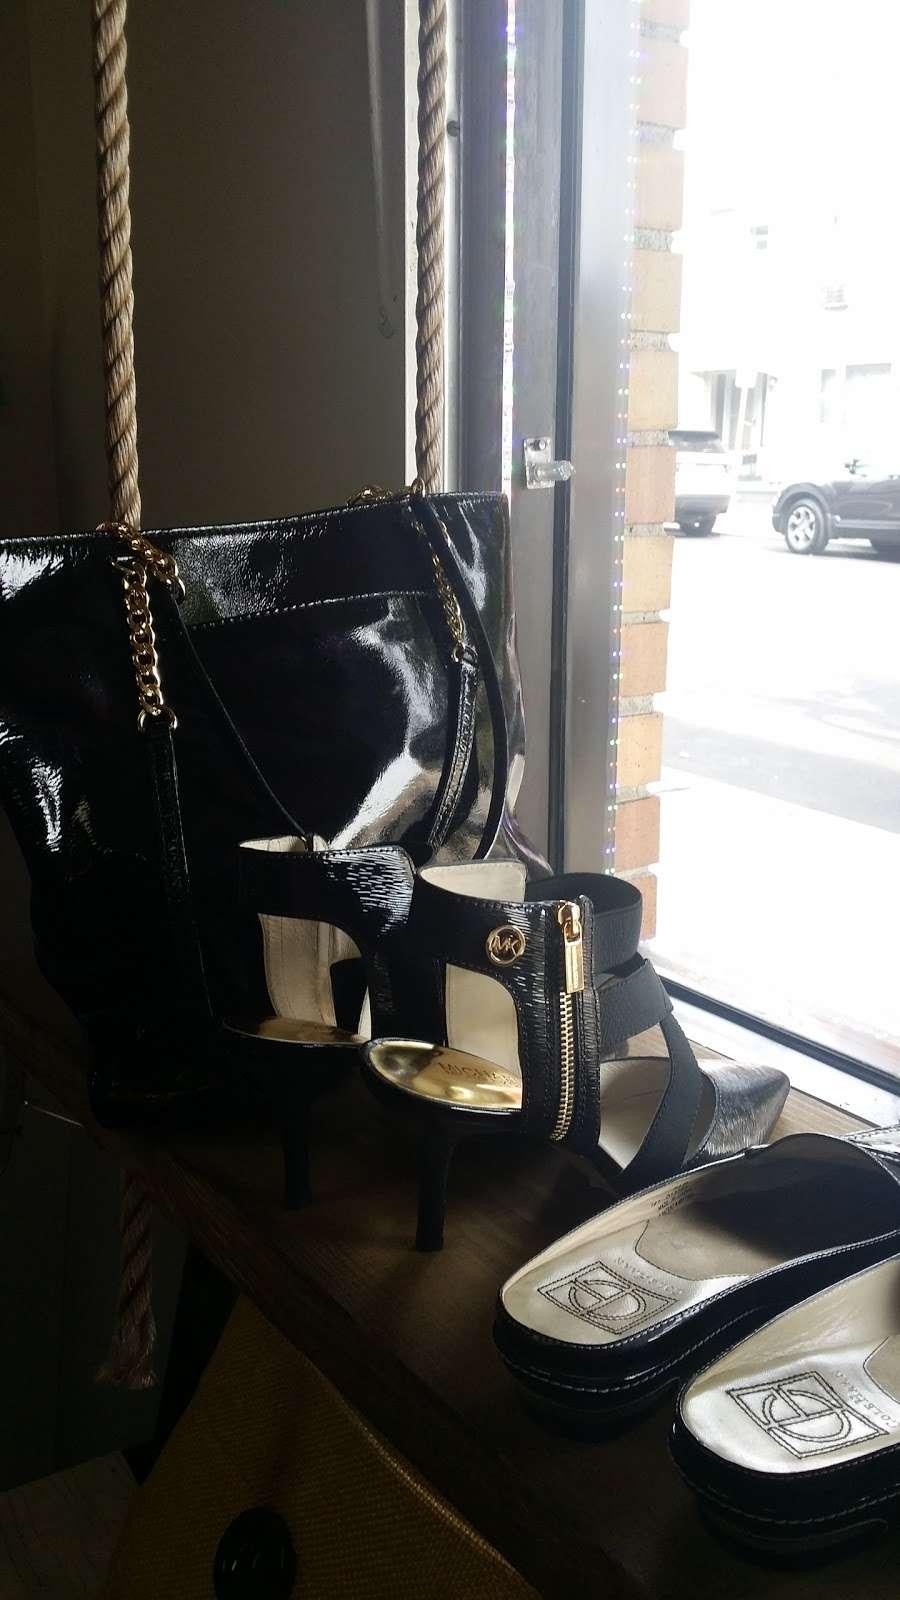 Glow Thrift Shop Store - clothing store  | Photo 10 of 10 | Address: 561 Palisade Ave, Jersey City, NJ 07307, USA | Phone: (646) 399-7397